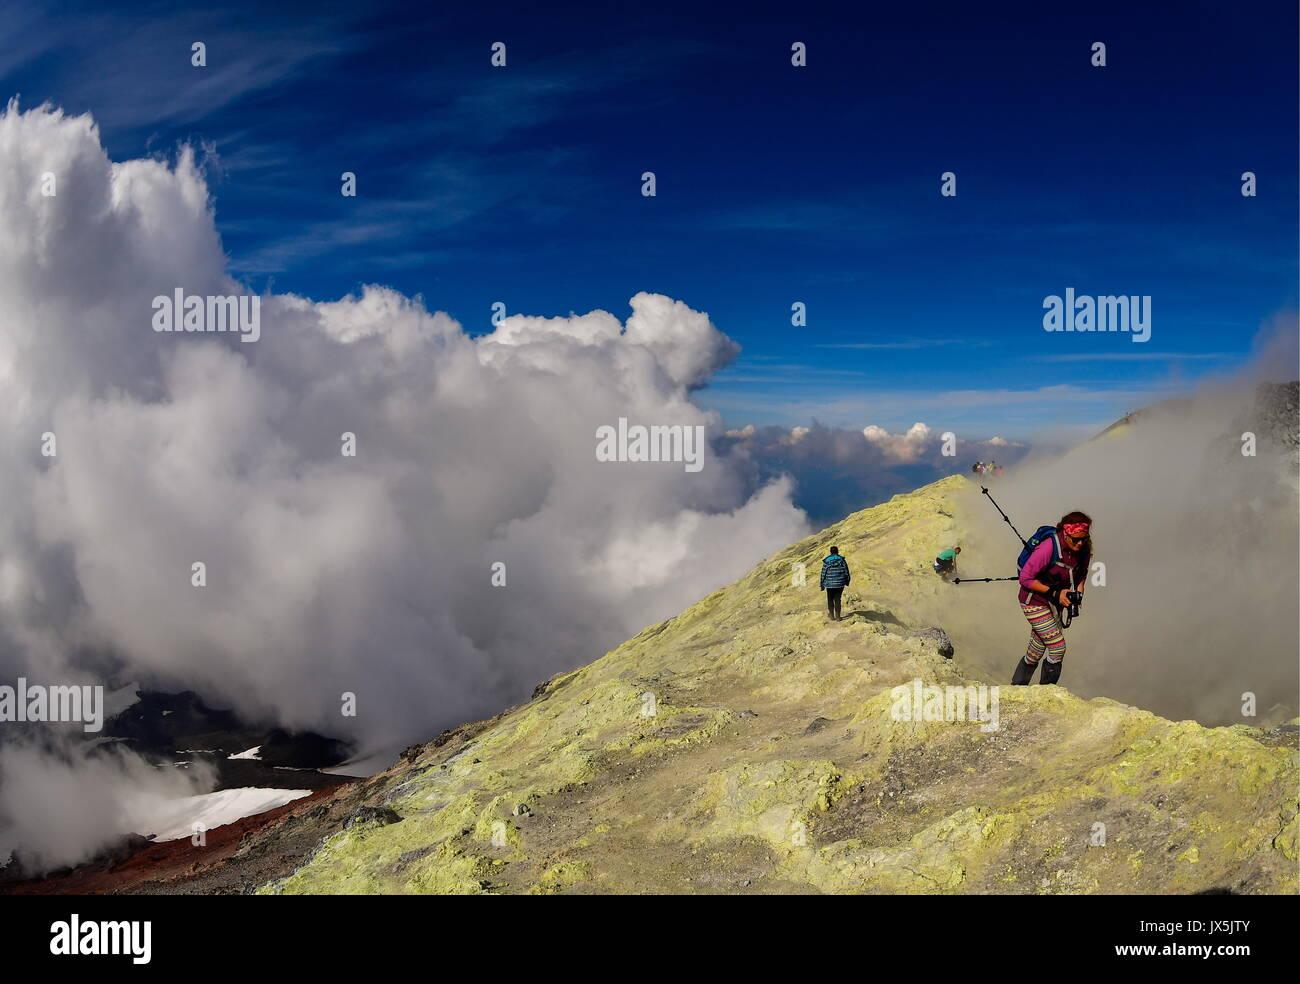 Kamtschatka, Russland. 12 Aug, 2017. Touristen am Krater des Avachinsky aktiver stratovulkan. Credit: Yuri Smityuk/TASS/Alamy Stockfoto